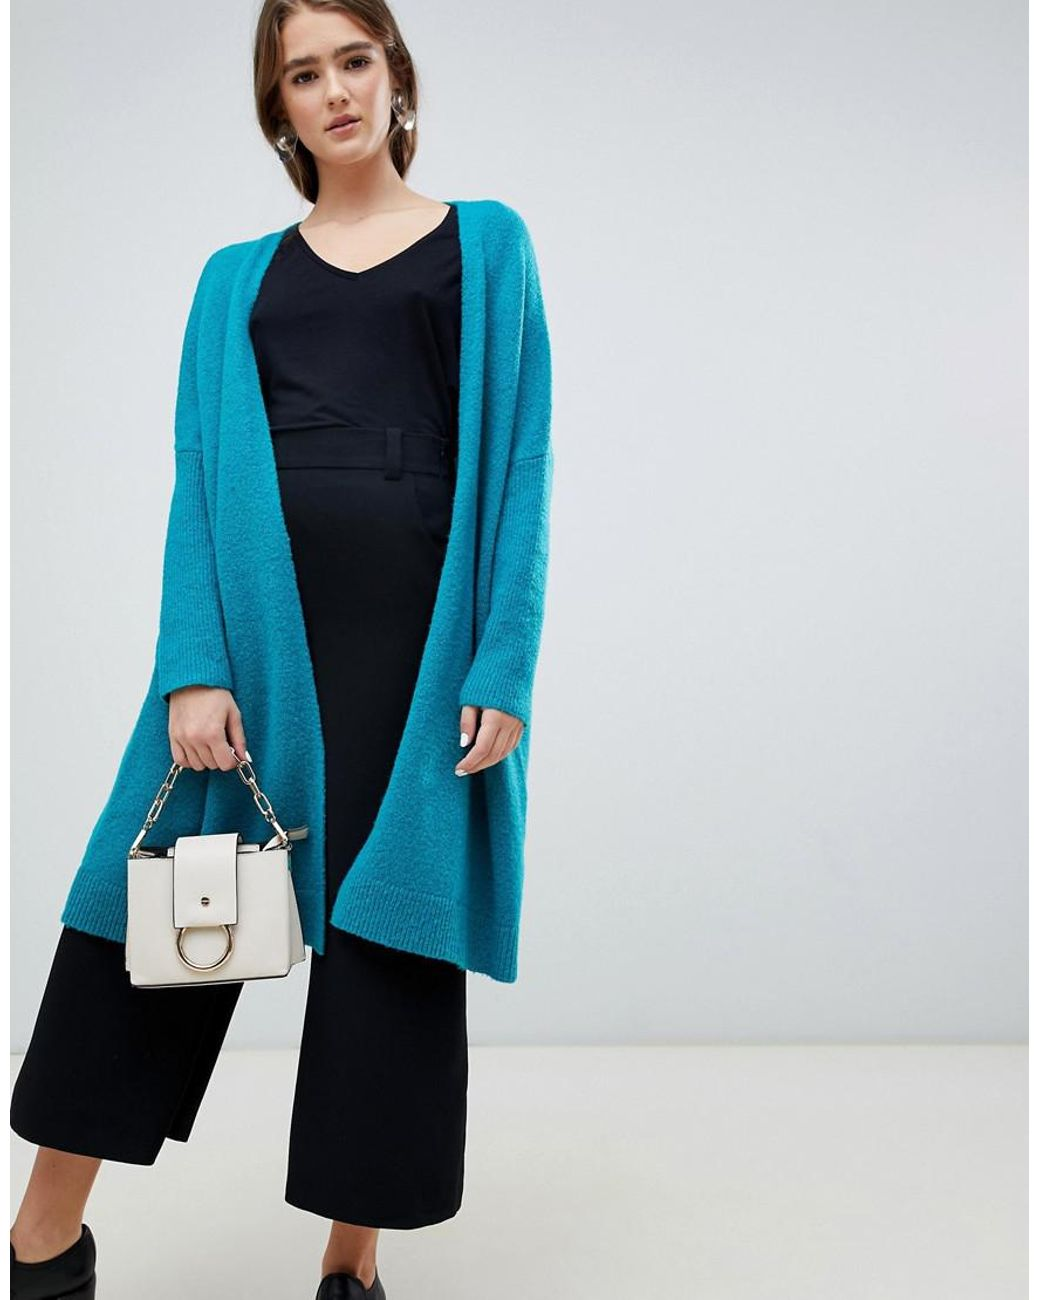 6de23188e164 Lyst - ASOS Eco Oversize Cardigan In Fluffy Yarn in Green